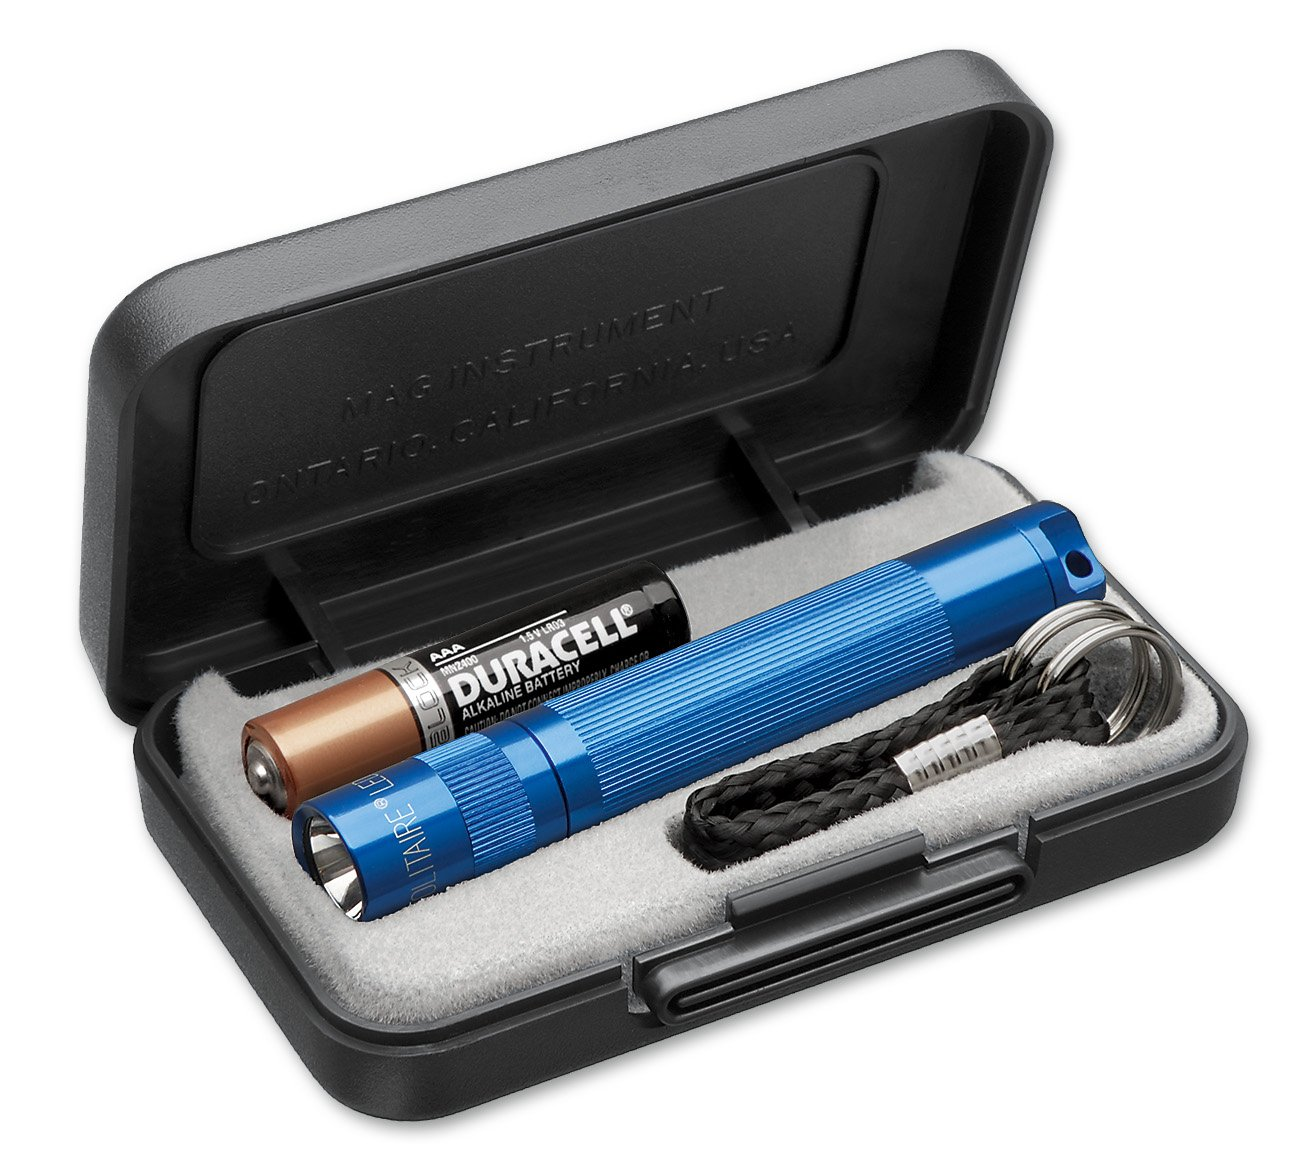 J3A112 Фонарь-брелок Maglite Маглайт LED (светодиод), Solitaire, 1ААА, синий, 8,1 см, в пластиково, 0000000473125